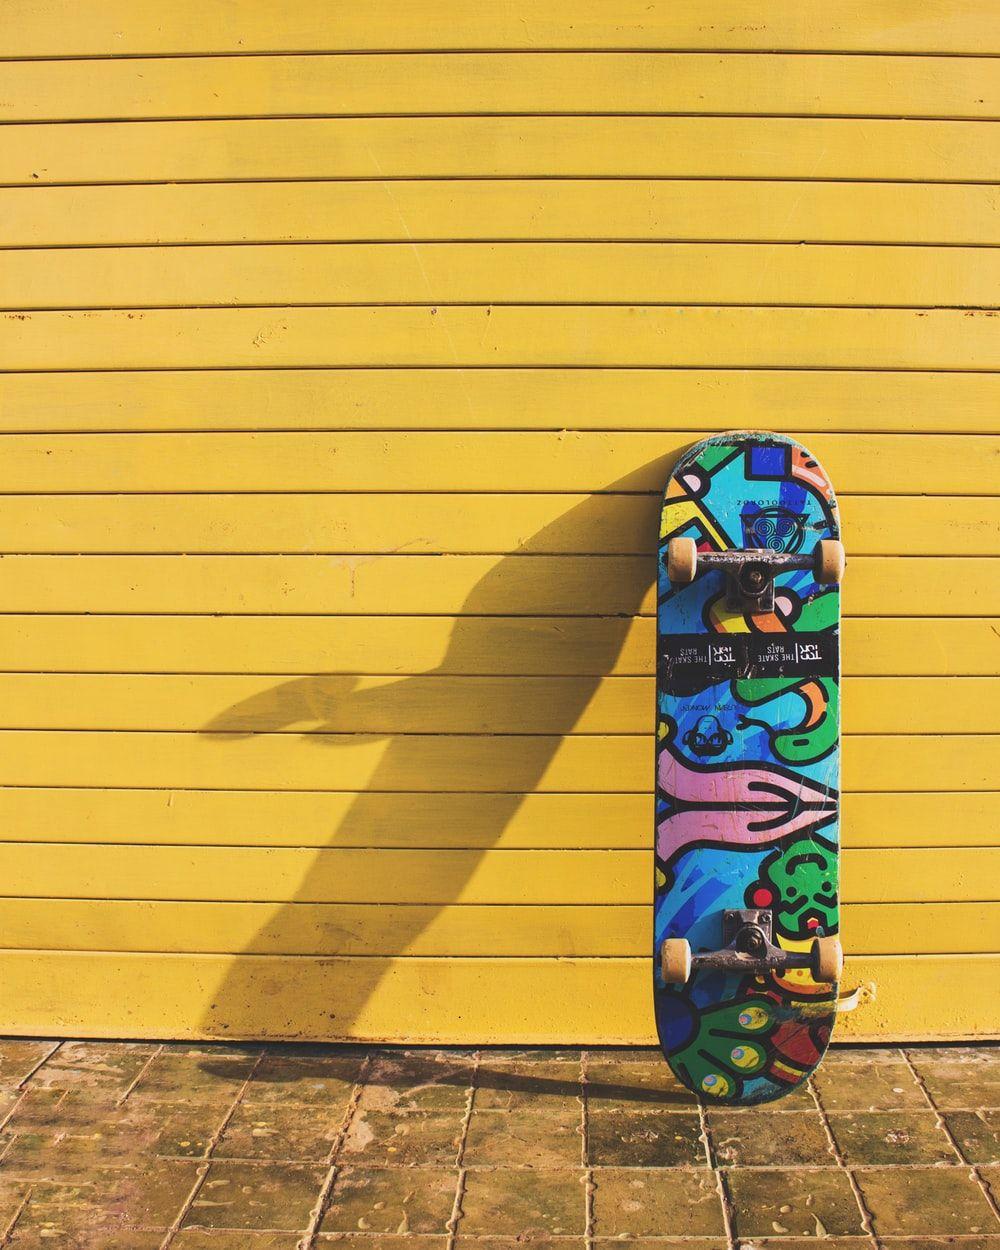 Skateboard Wallpapers   Top Skateboard Backgrounds 1000x1250